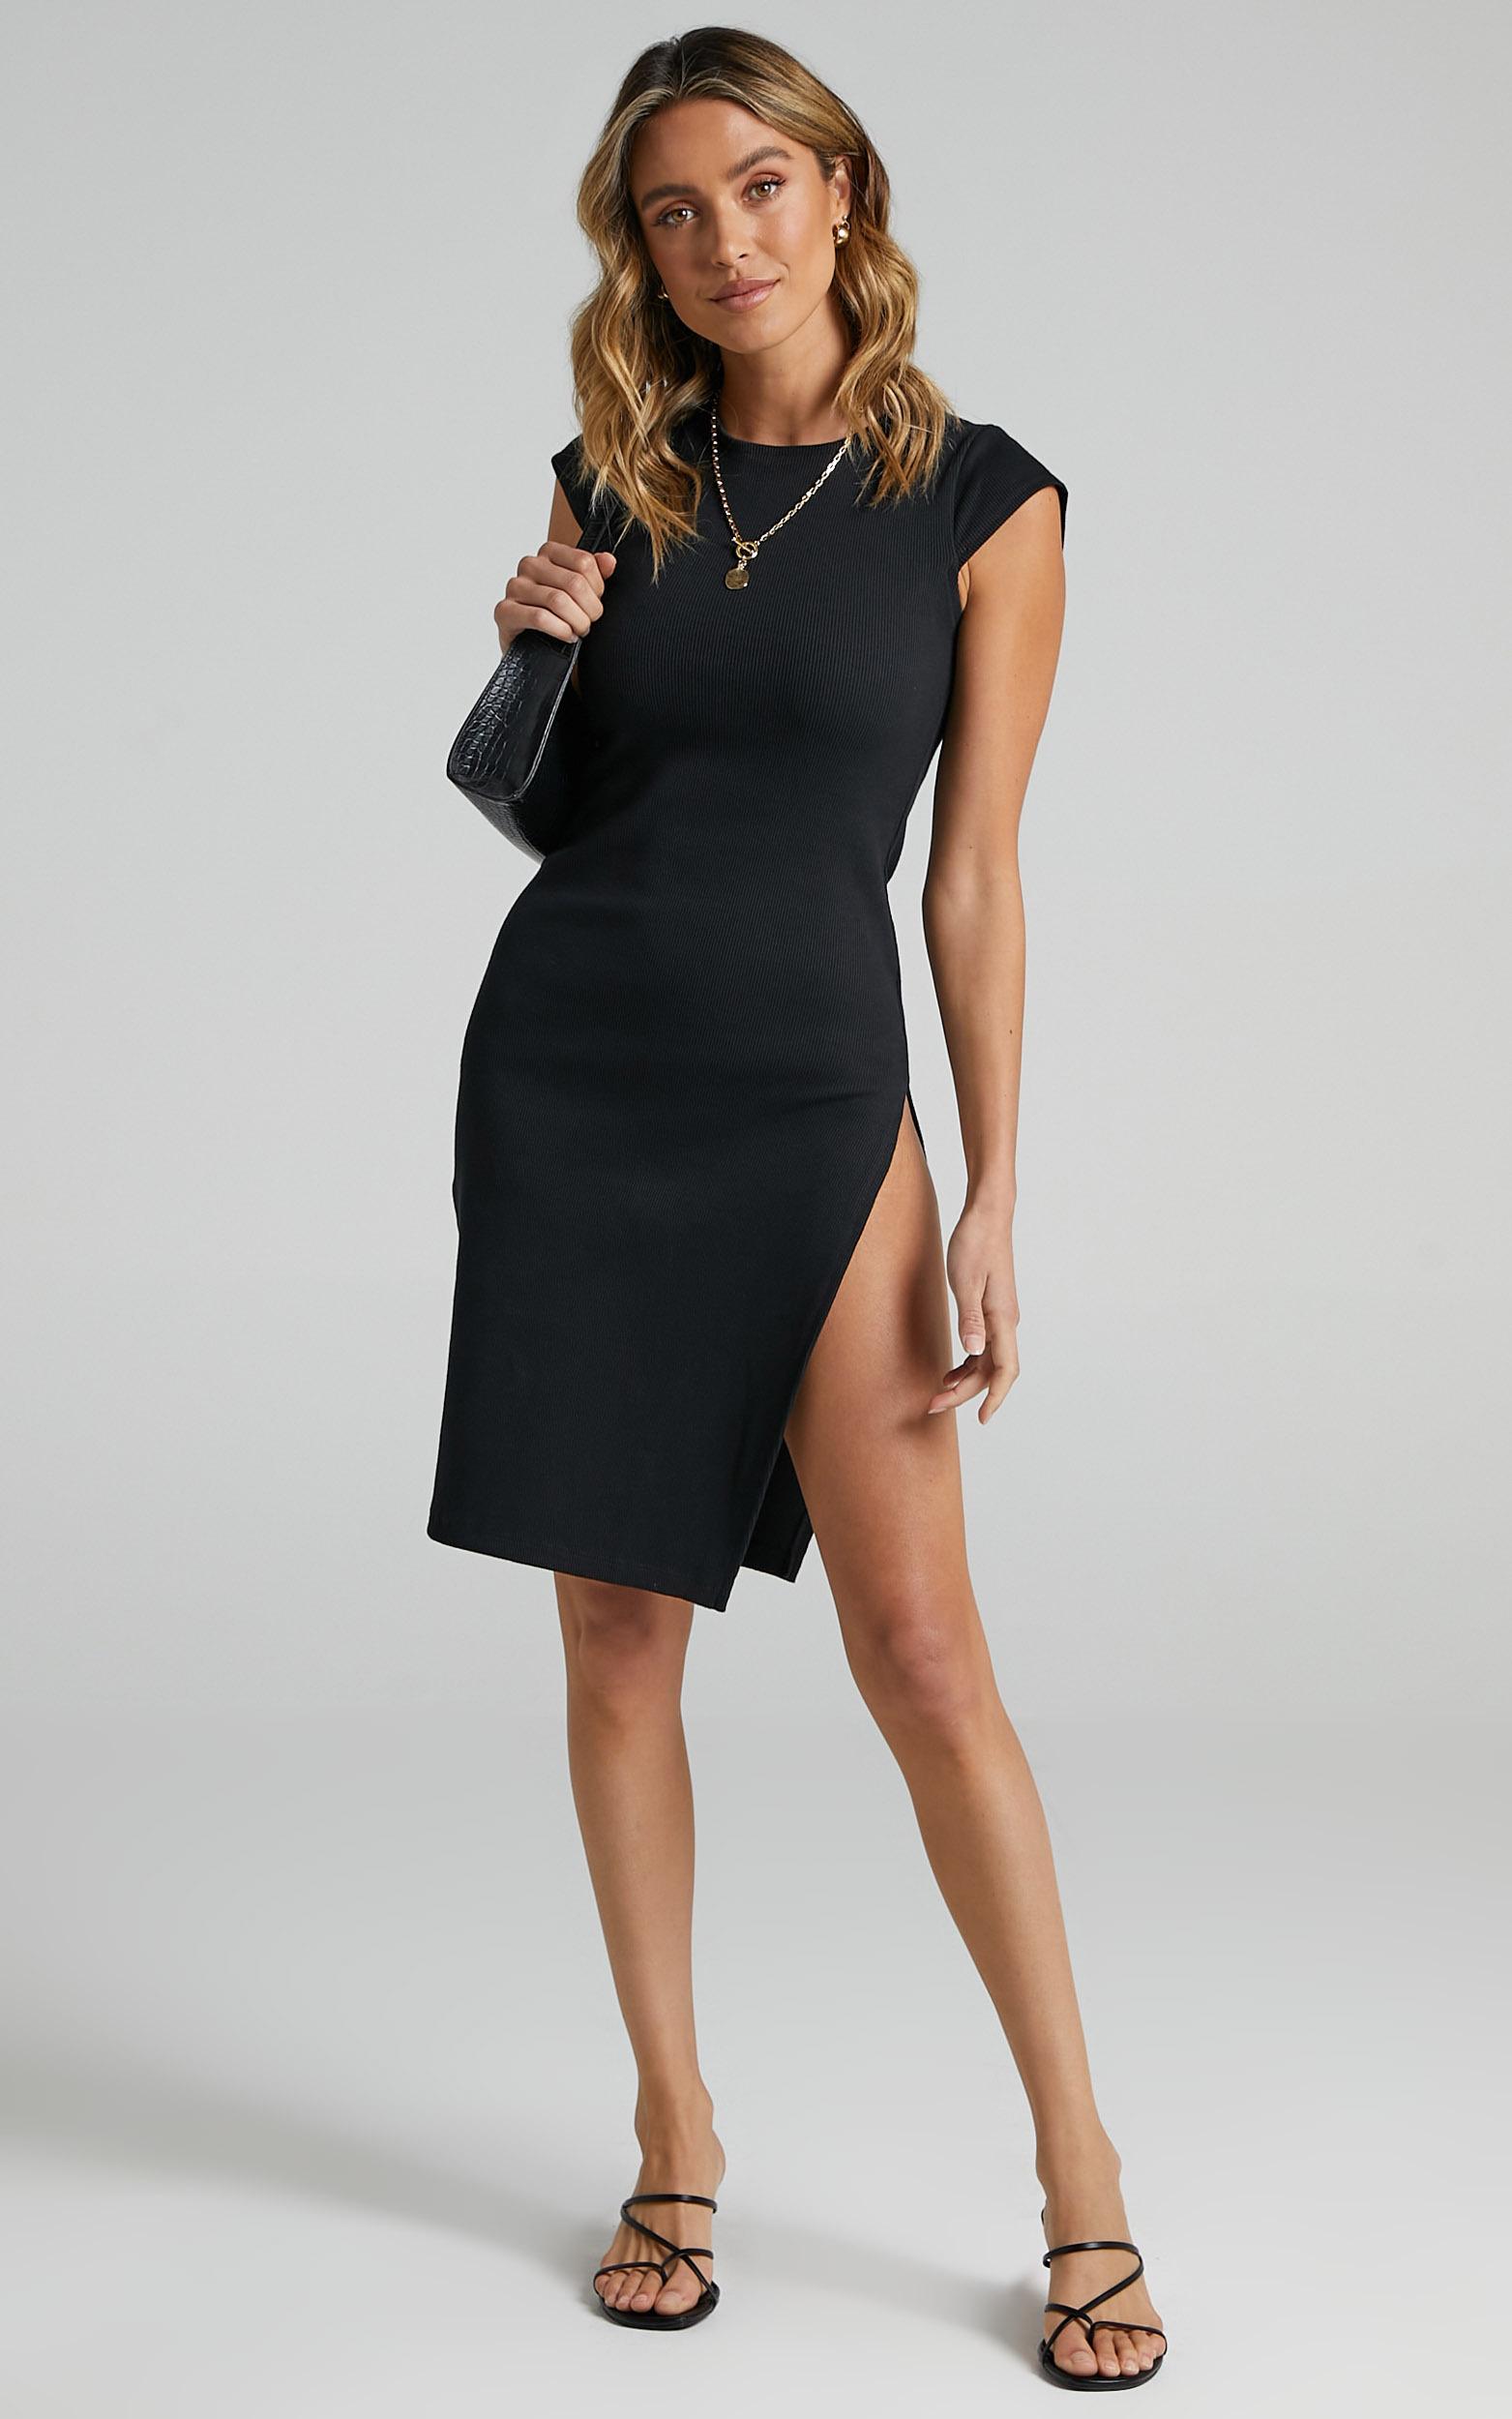 Lioness - Don`t Blame Me Midi Dress in Black - 06, BLK1, hi-res image number null